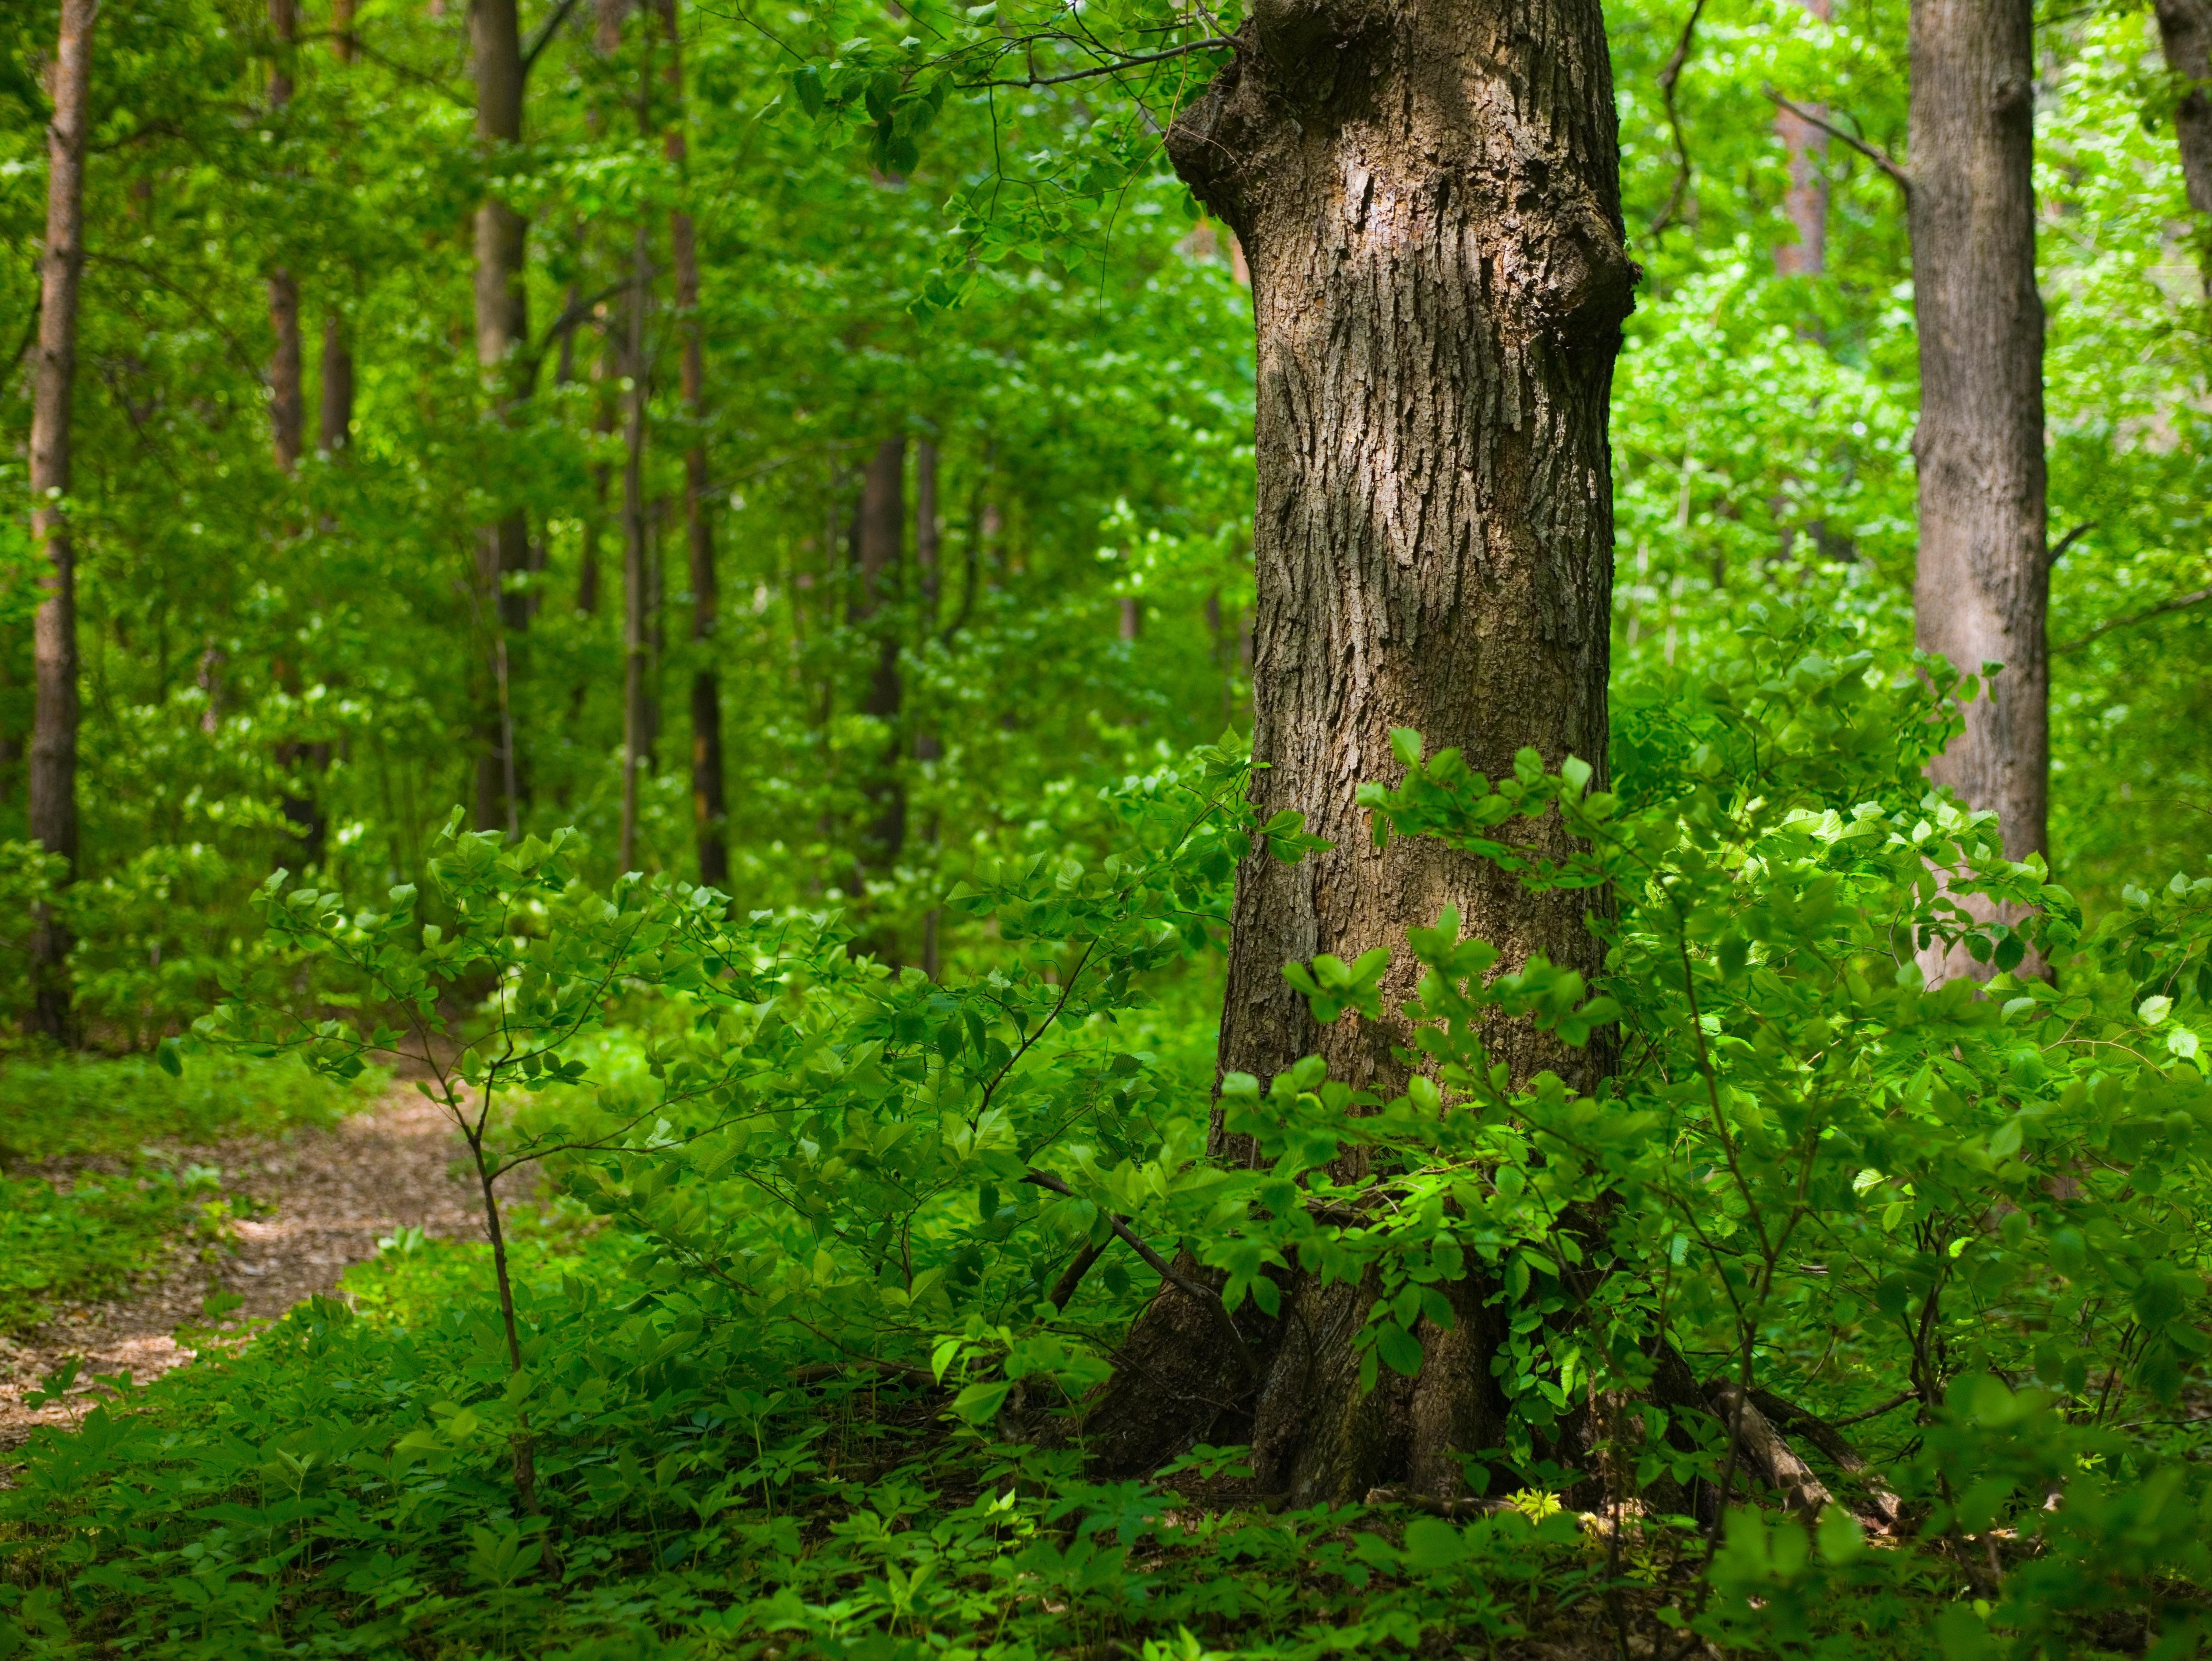 лес зелень ветви  № 2801109 бесплатно